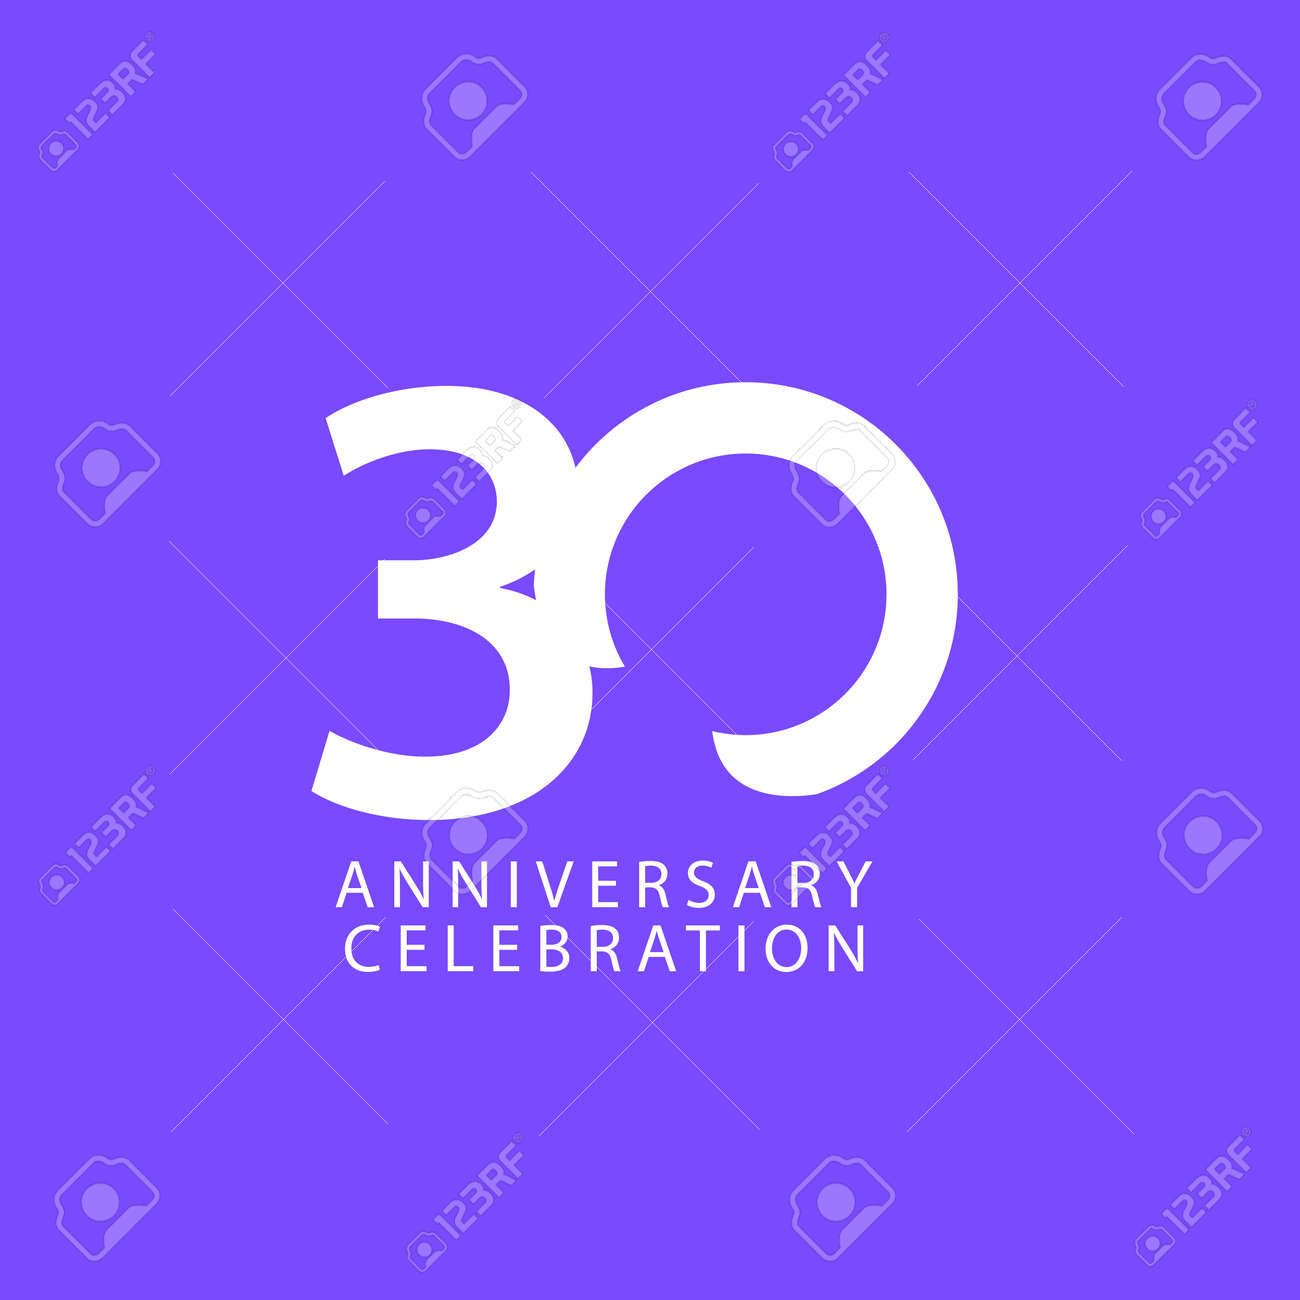 30 Years Anniversary Celebration Vector Template Design Illustration - 163698082